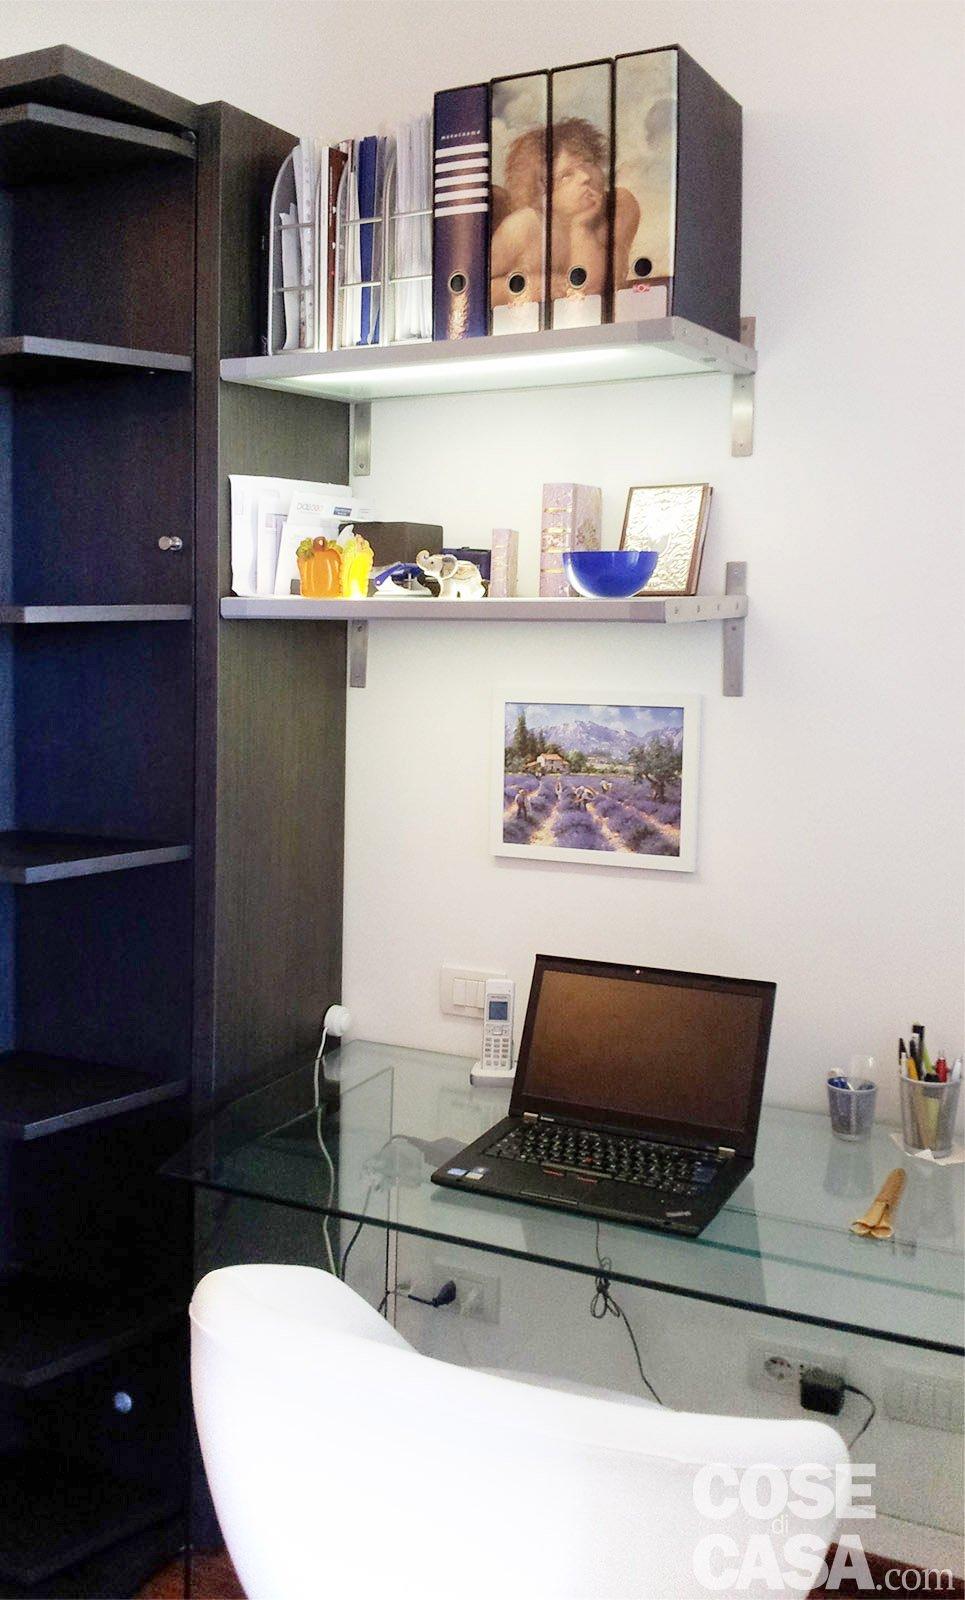 Great arredo ufficio ikea stanza ufficio ikea arredamento for Ikea arredo ufficio